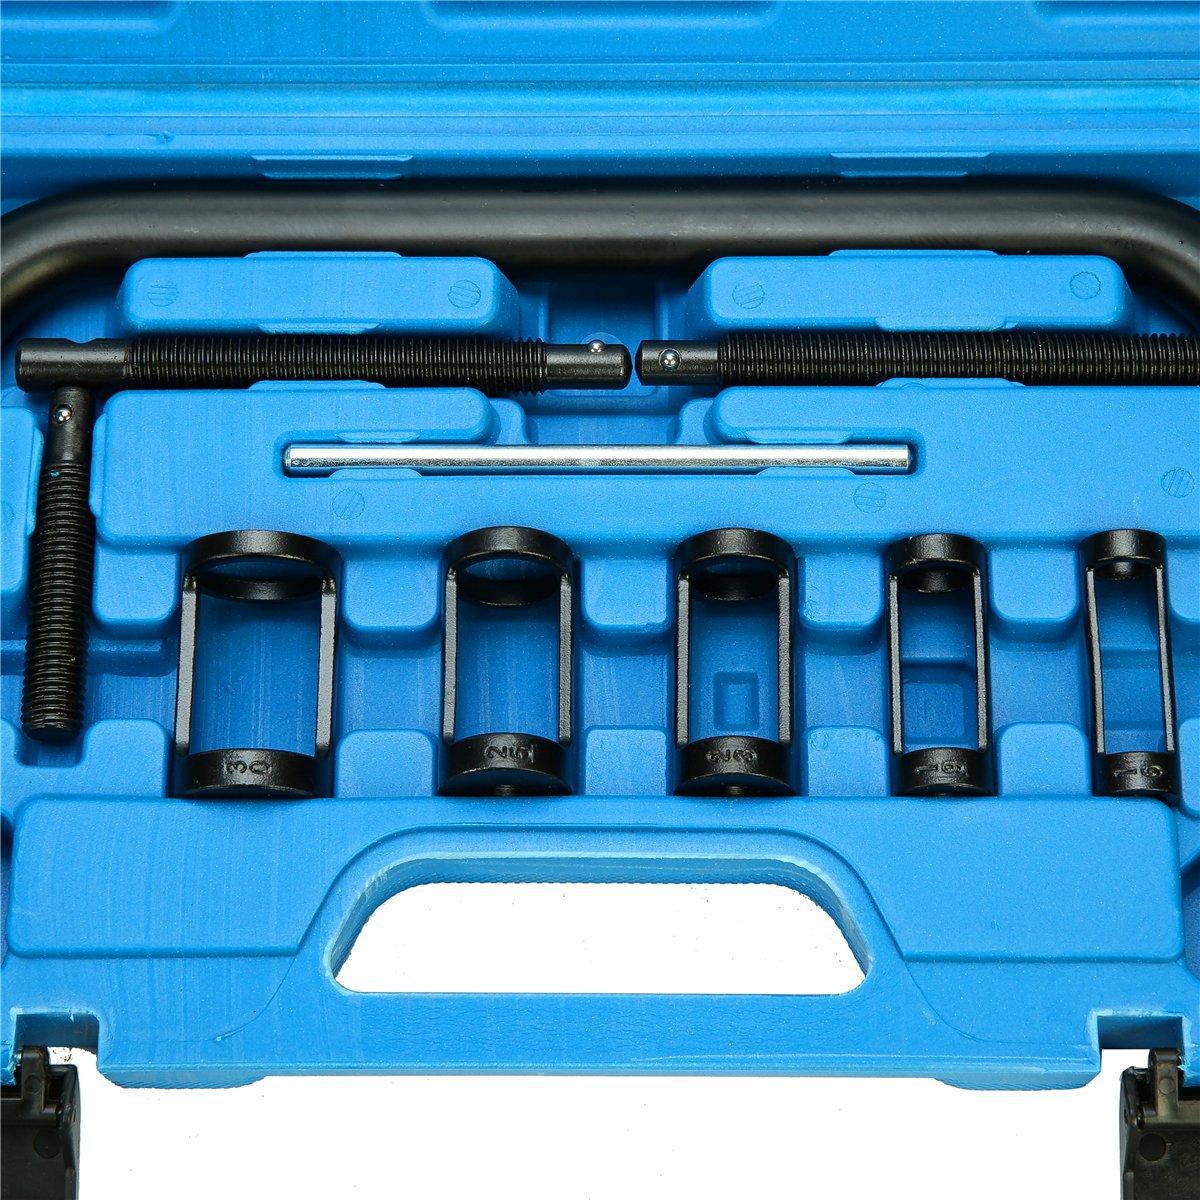 8milelake AUTO Solid Valve Spring Compressor Automotive Tool Set Repair Tool Kit by 8MILELAE (Image #6)